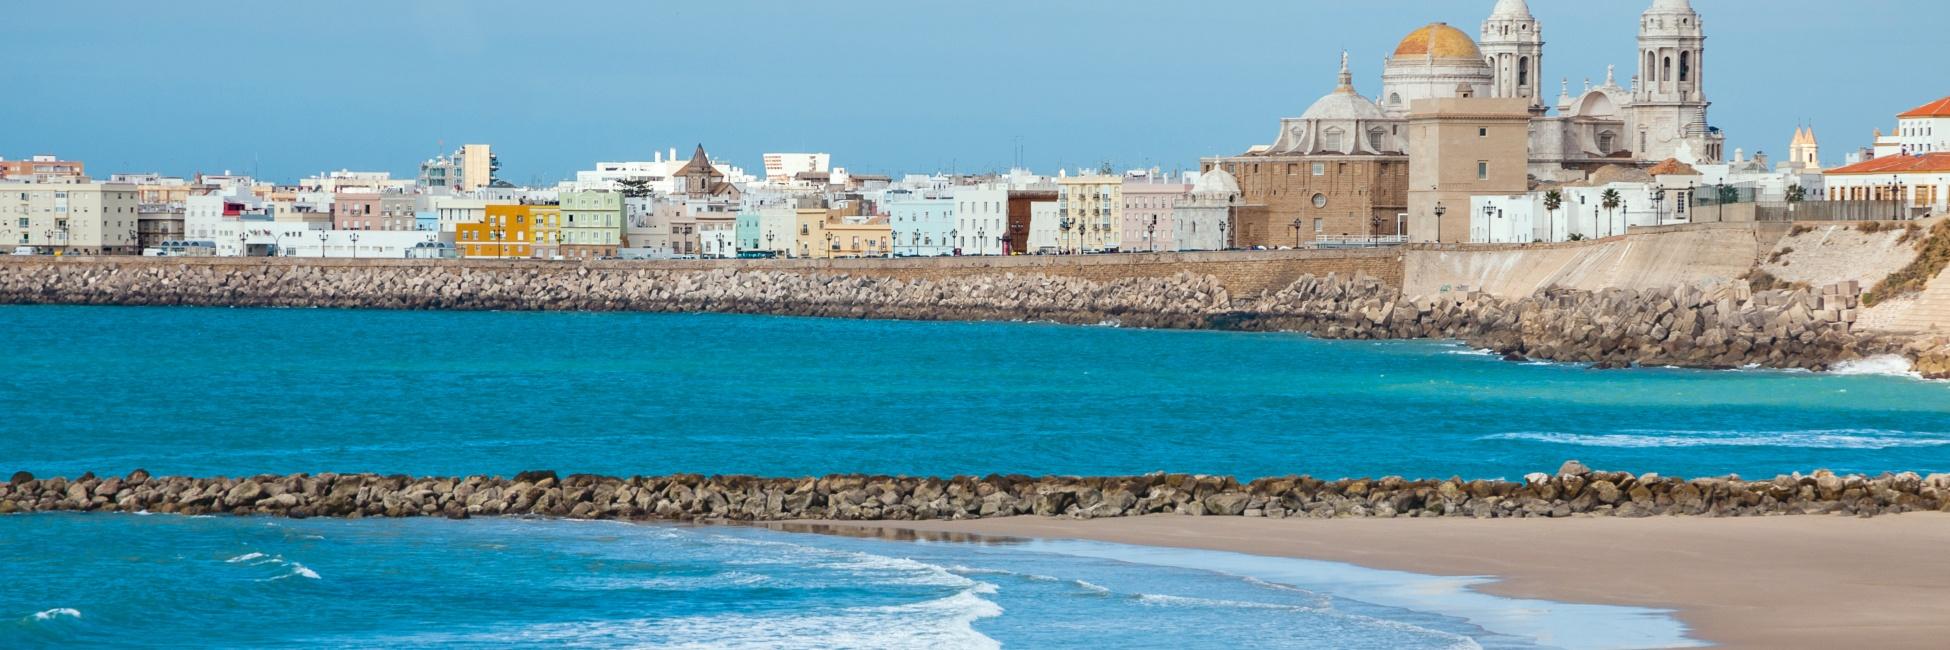 Hike The Waterfront In Cadiz Croisieurope Cruises